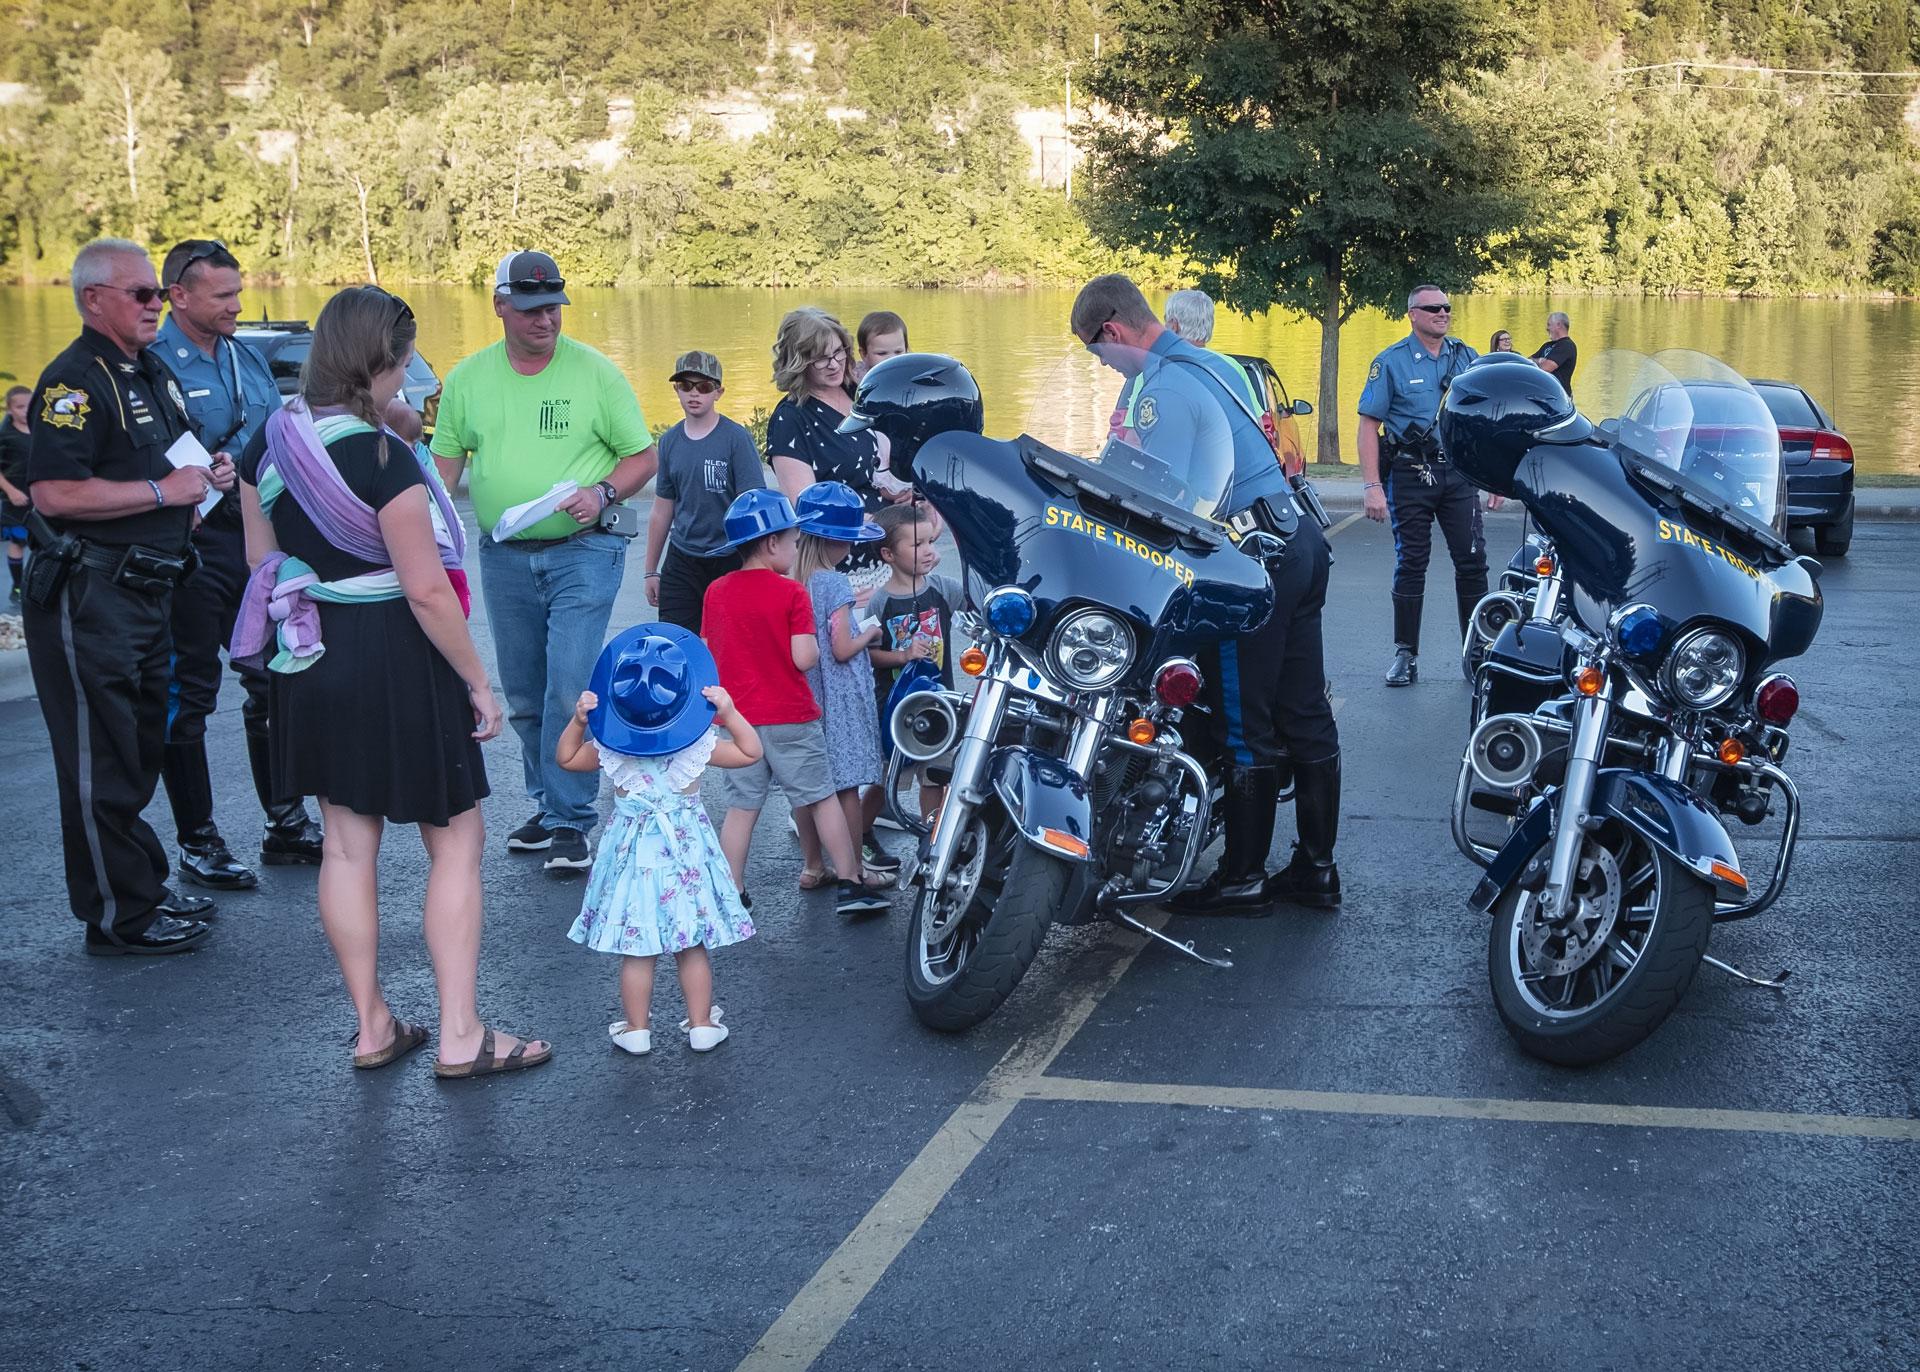 missouri state highway patrol motorcyles